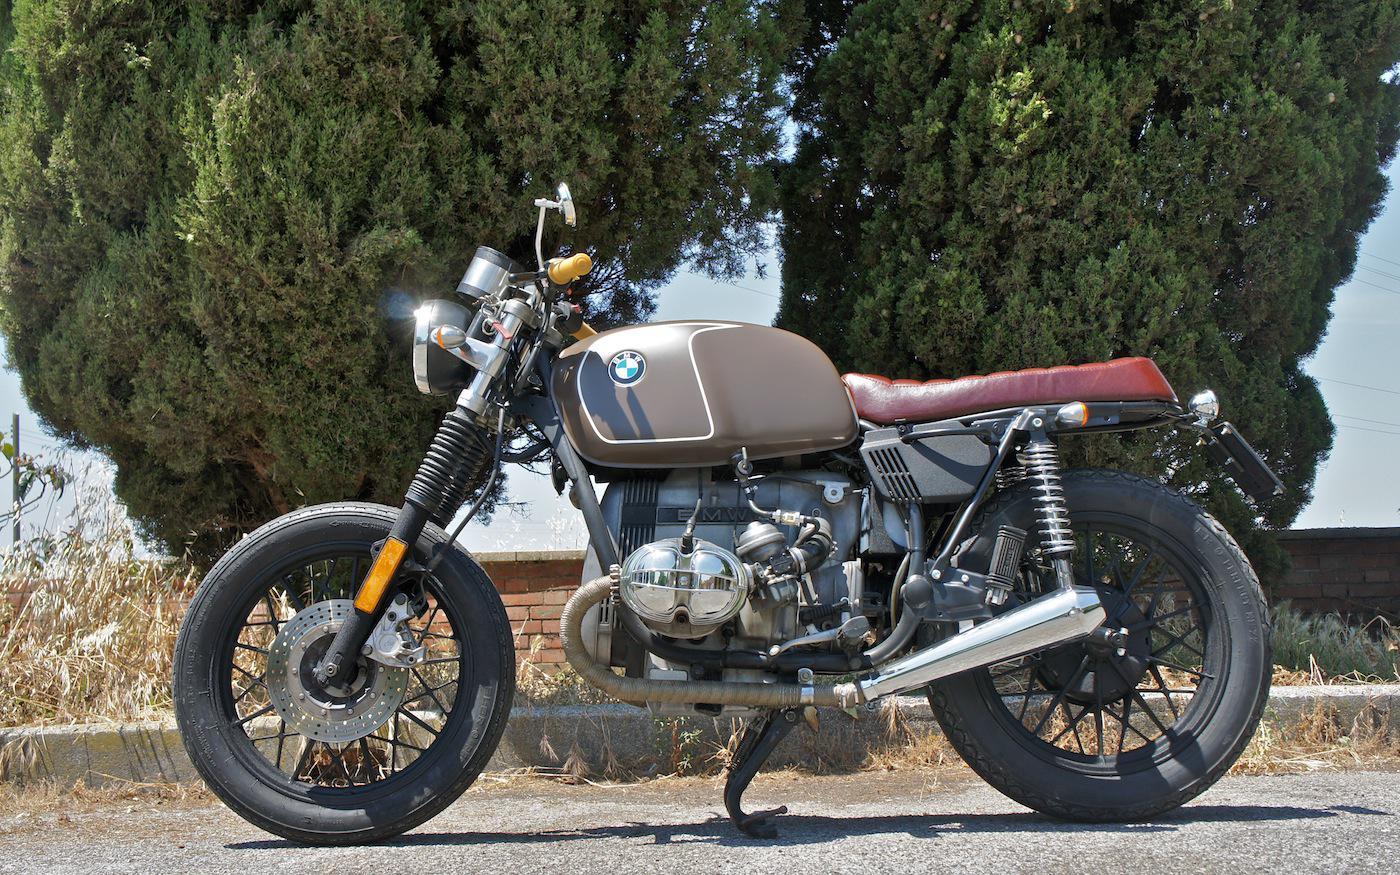 bmw r45 classic ride by luis moto motorrad fotos. Black Bedroom Furniture Sets. Home Design Ideas